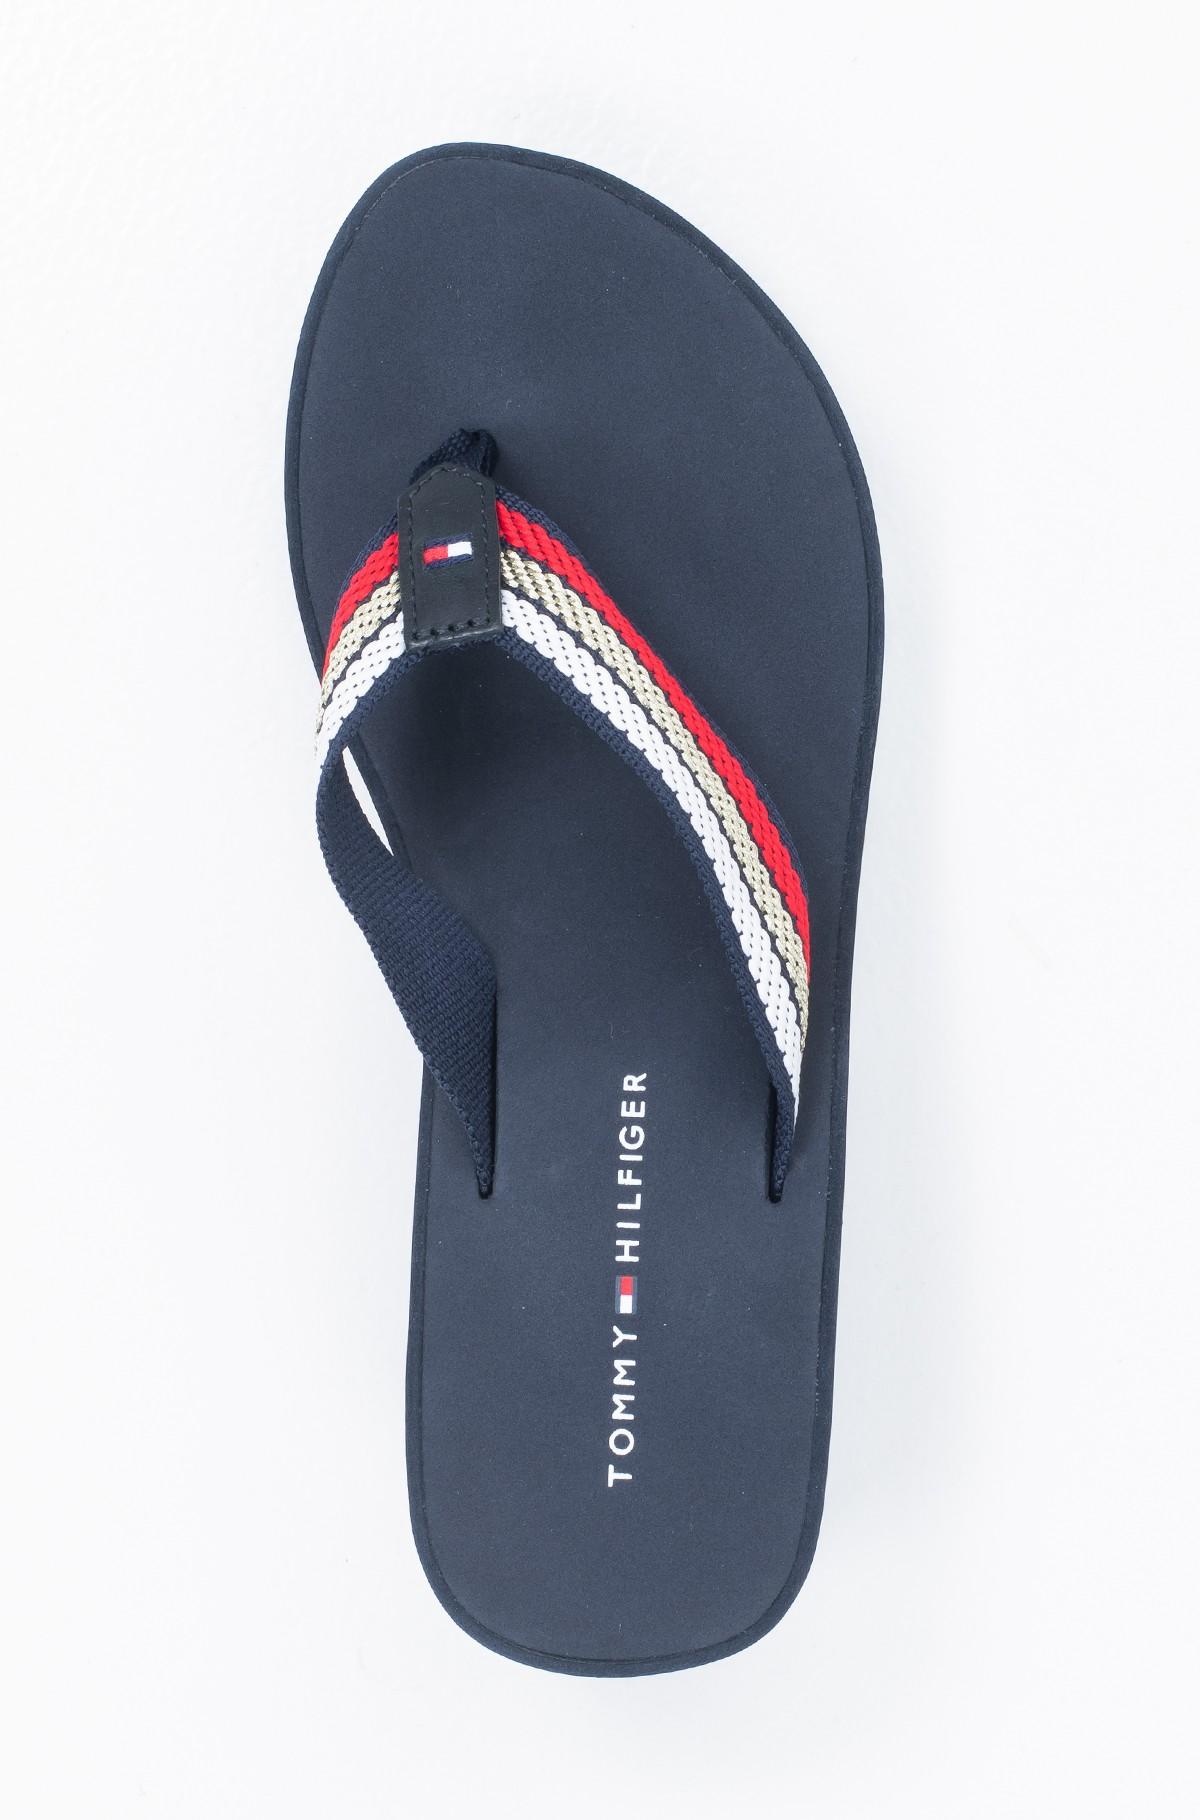 9a4171819a0e Platform flip-flops ICONIC WEDGE BEACH SANDAL Tommy Hilfiger, Womens ...